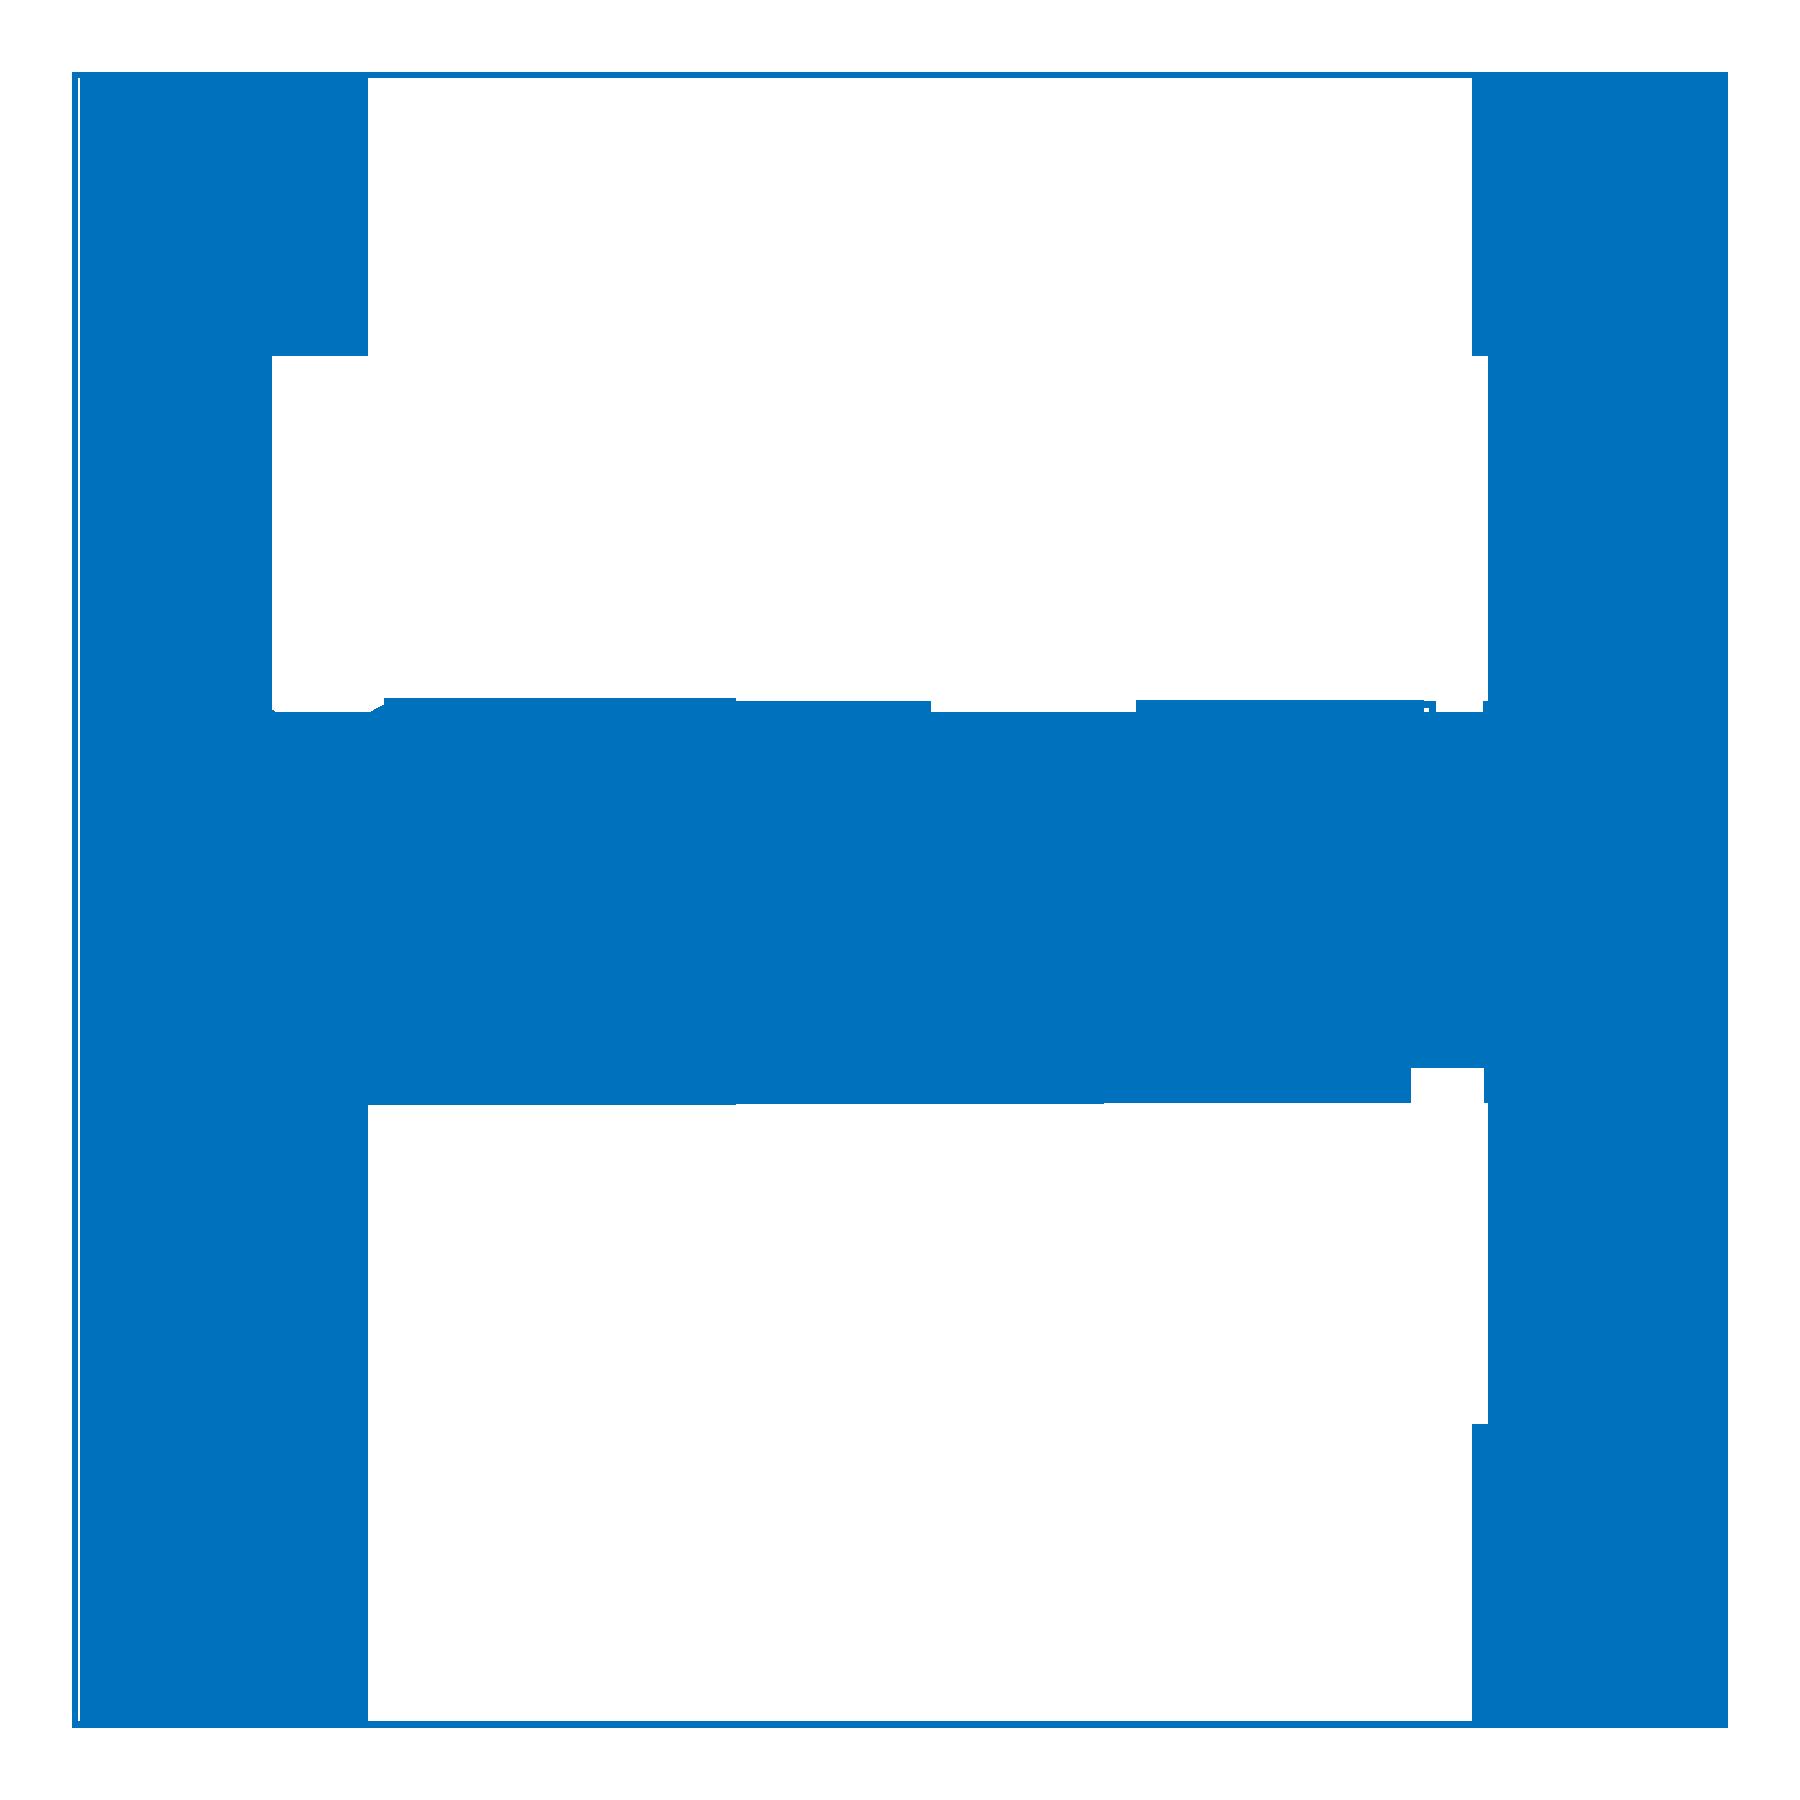 pde-logo-square-blue-on-transparent.png